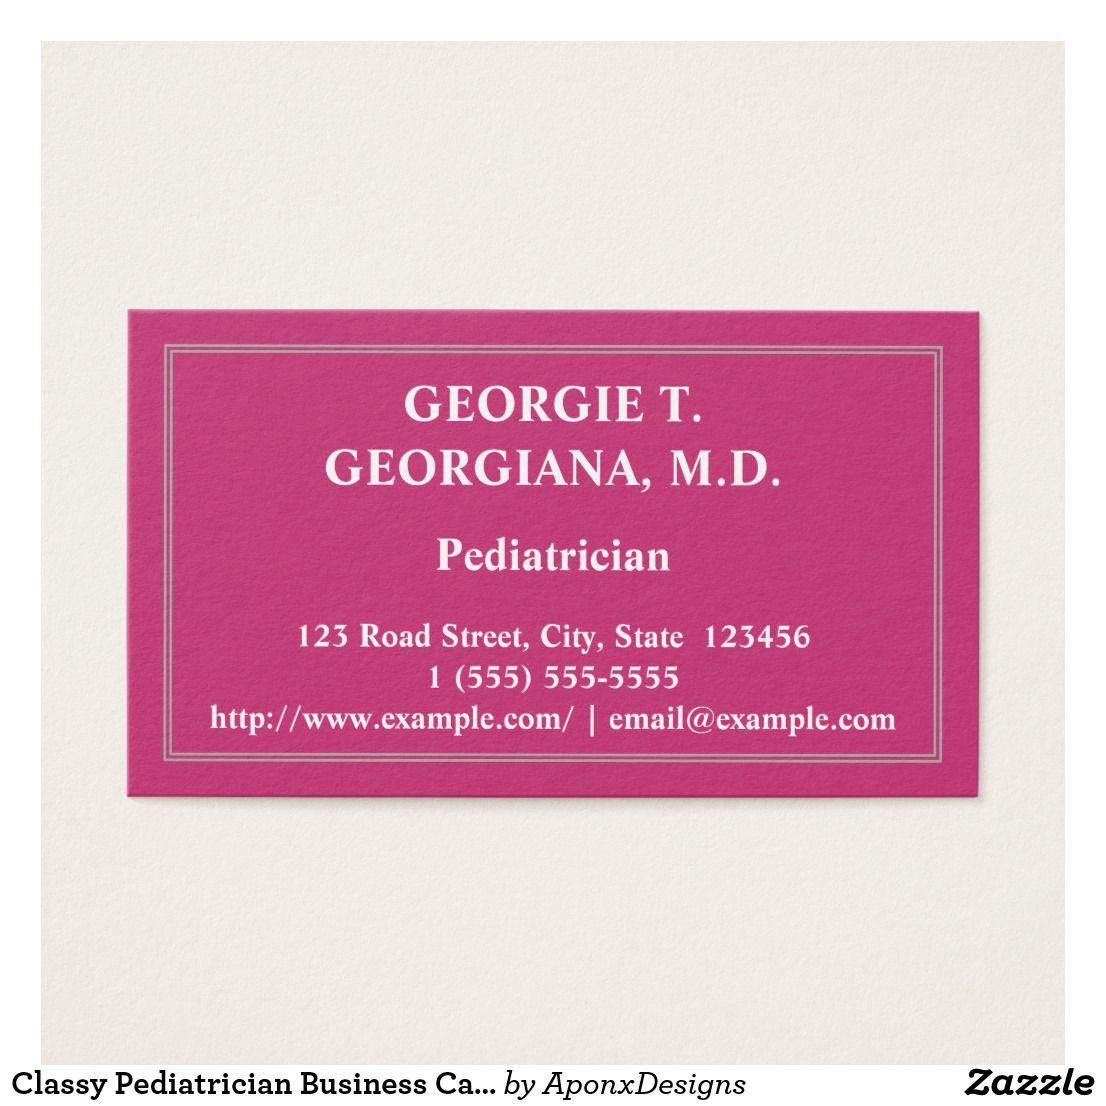 Classy Pediatrician Business Card | Customizable Business Card ...